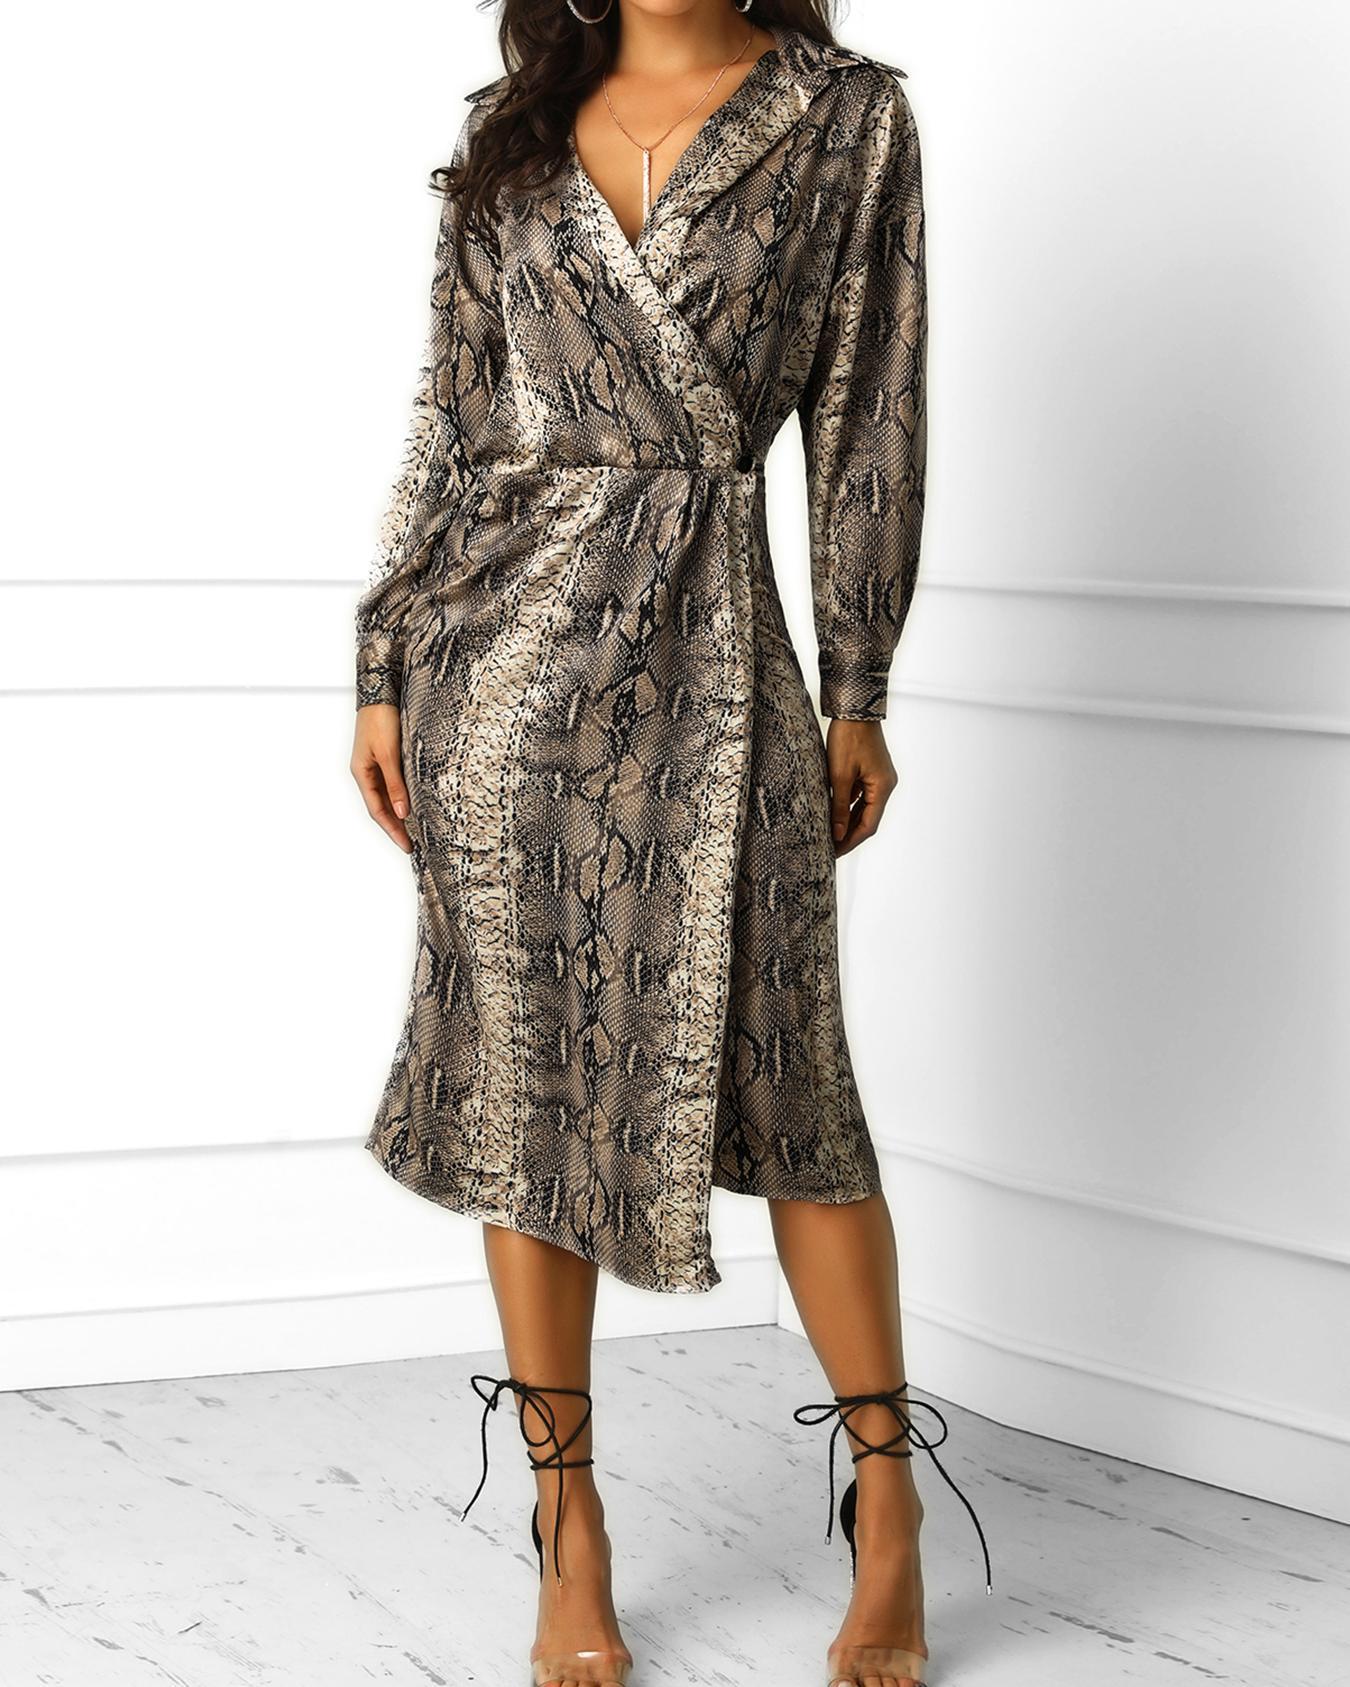 Snakeskin Print Wrap Long Sleeve Dress